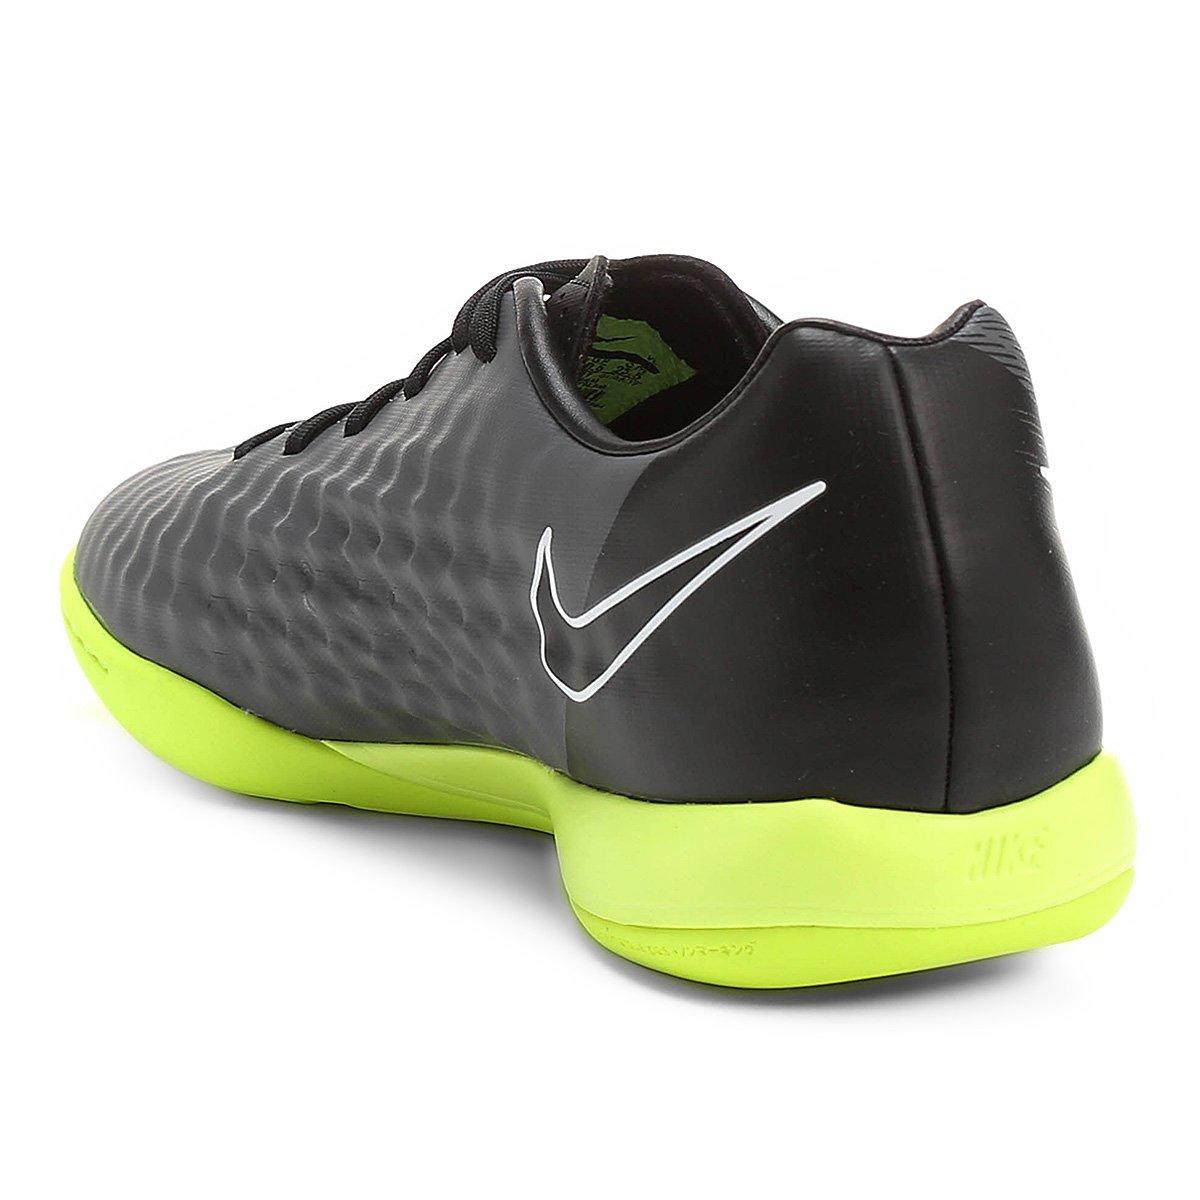 Chuteira Futsal Nike Magista Onda II IC Masculina - Chumbo e Verde ... 7514127a1a986